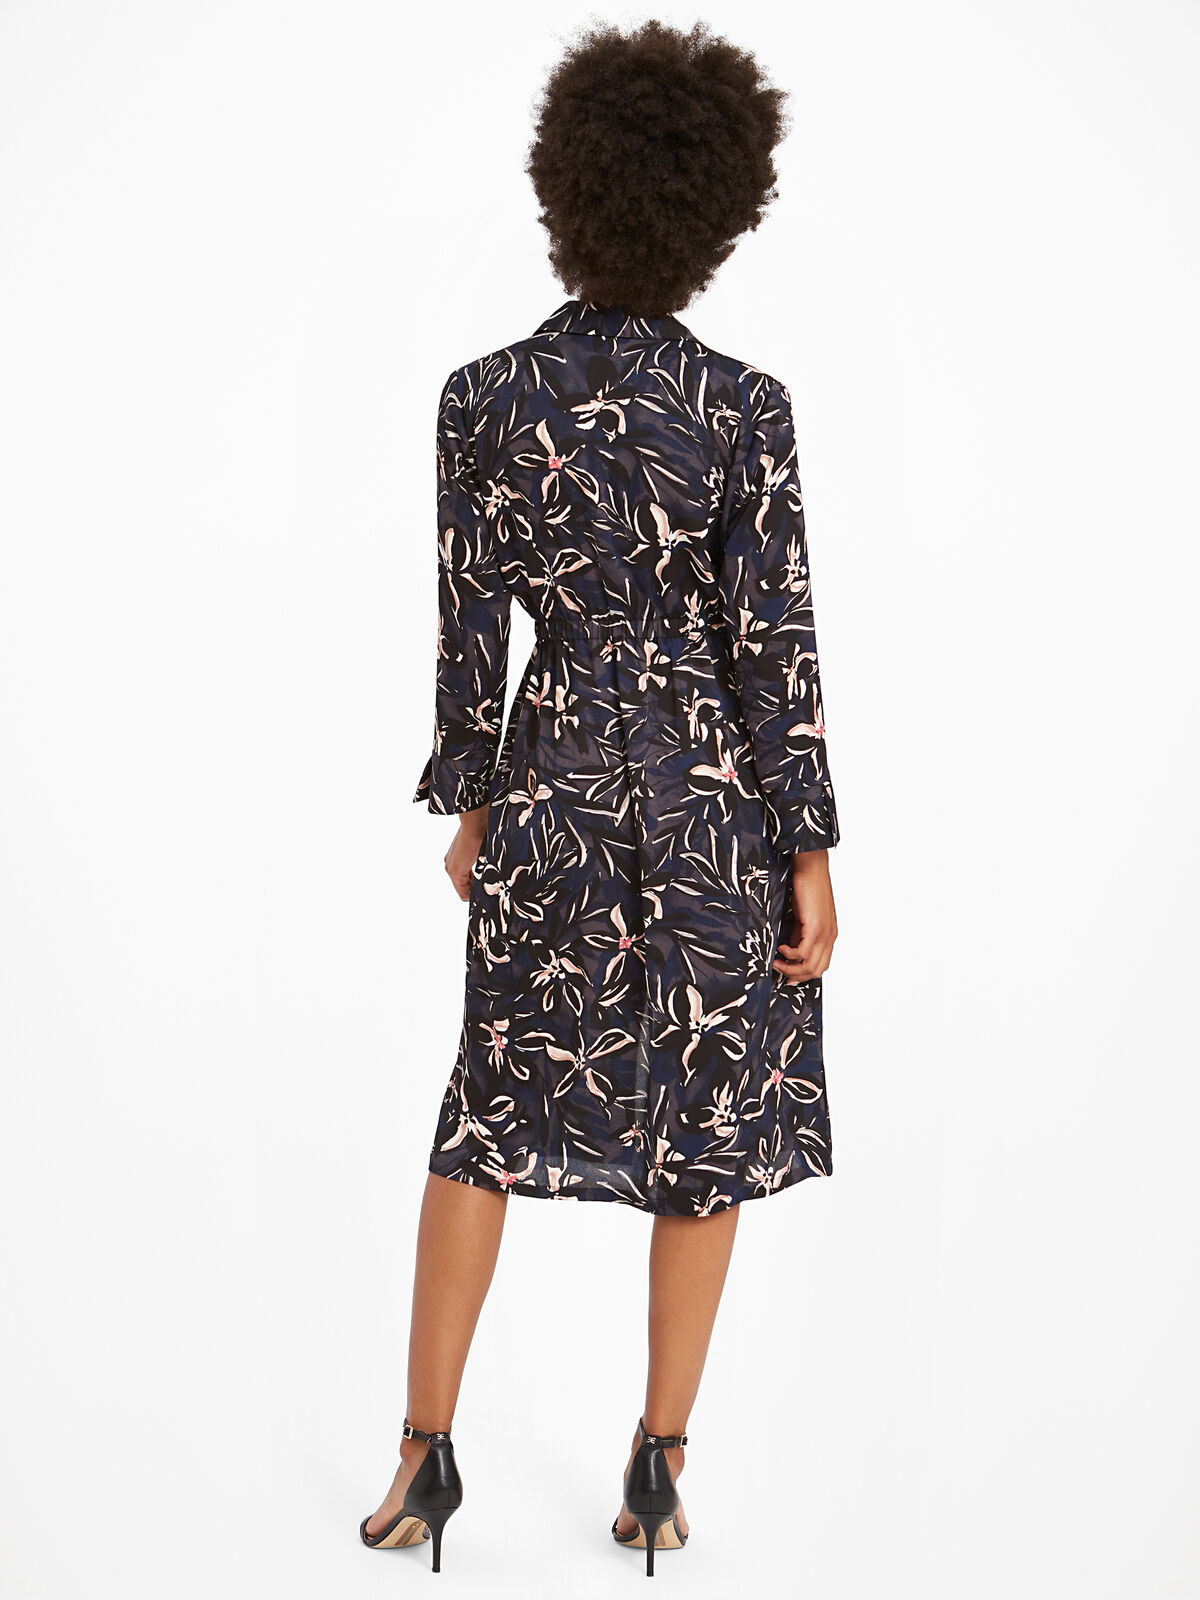 Inky Blooms Tie Dress